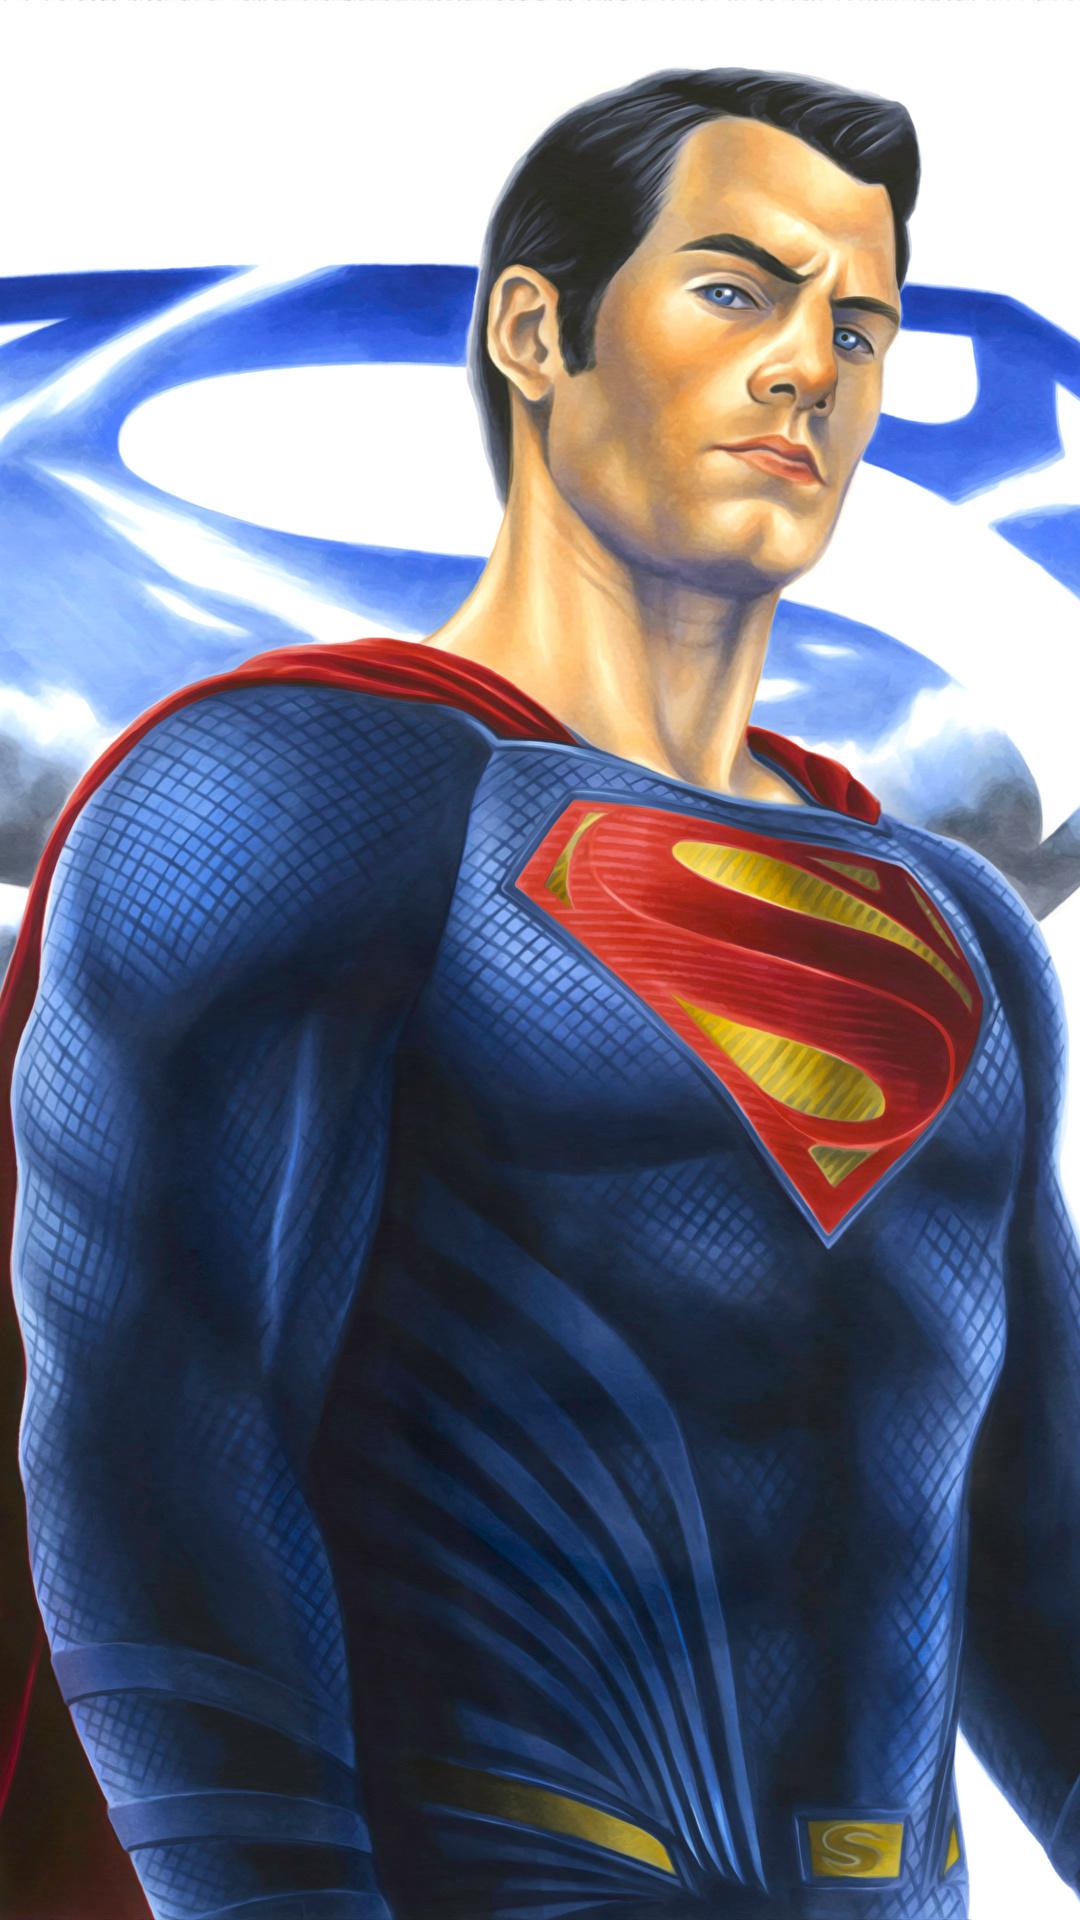 1080x1920 Superman Herói Homem Fantasia para celular Telemóvel